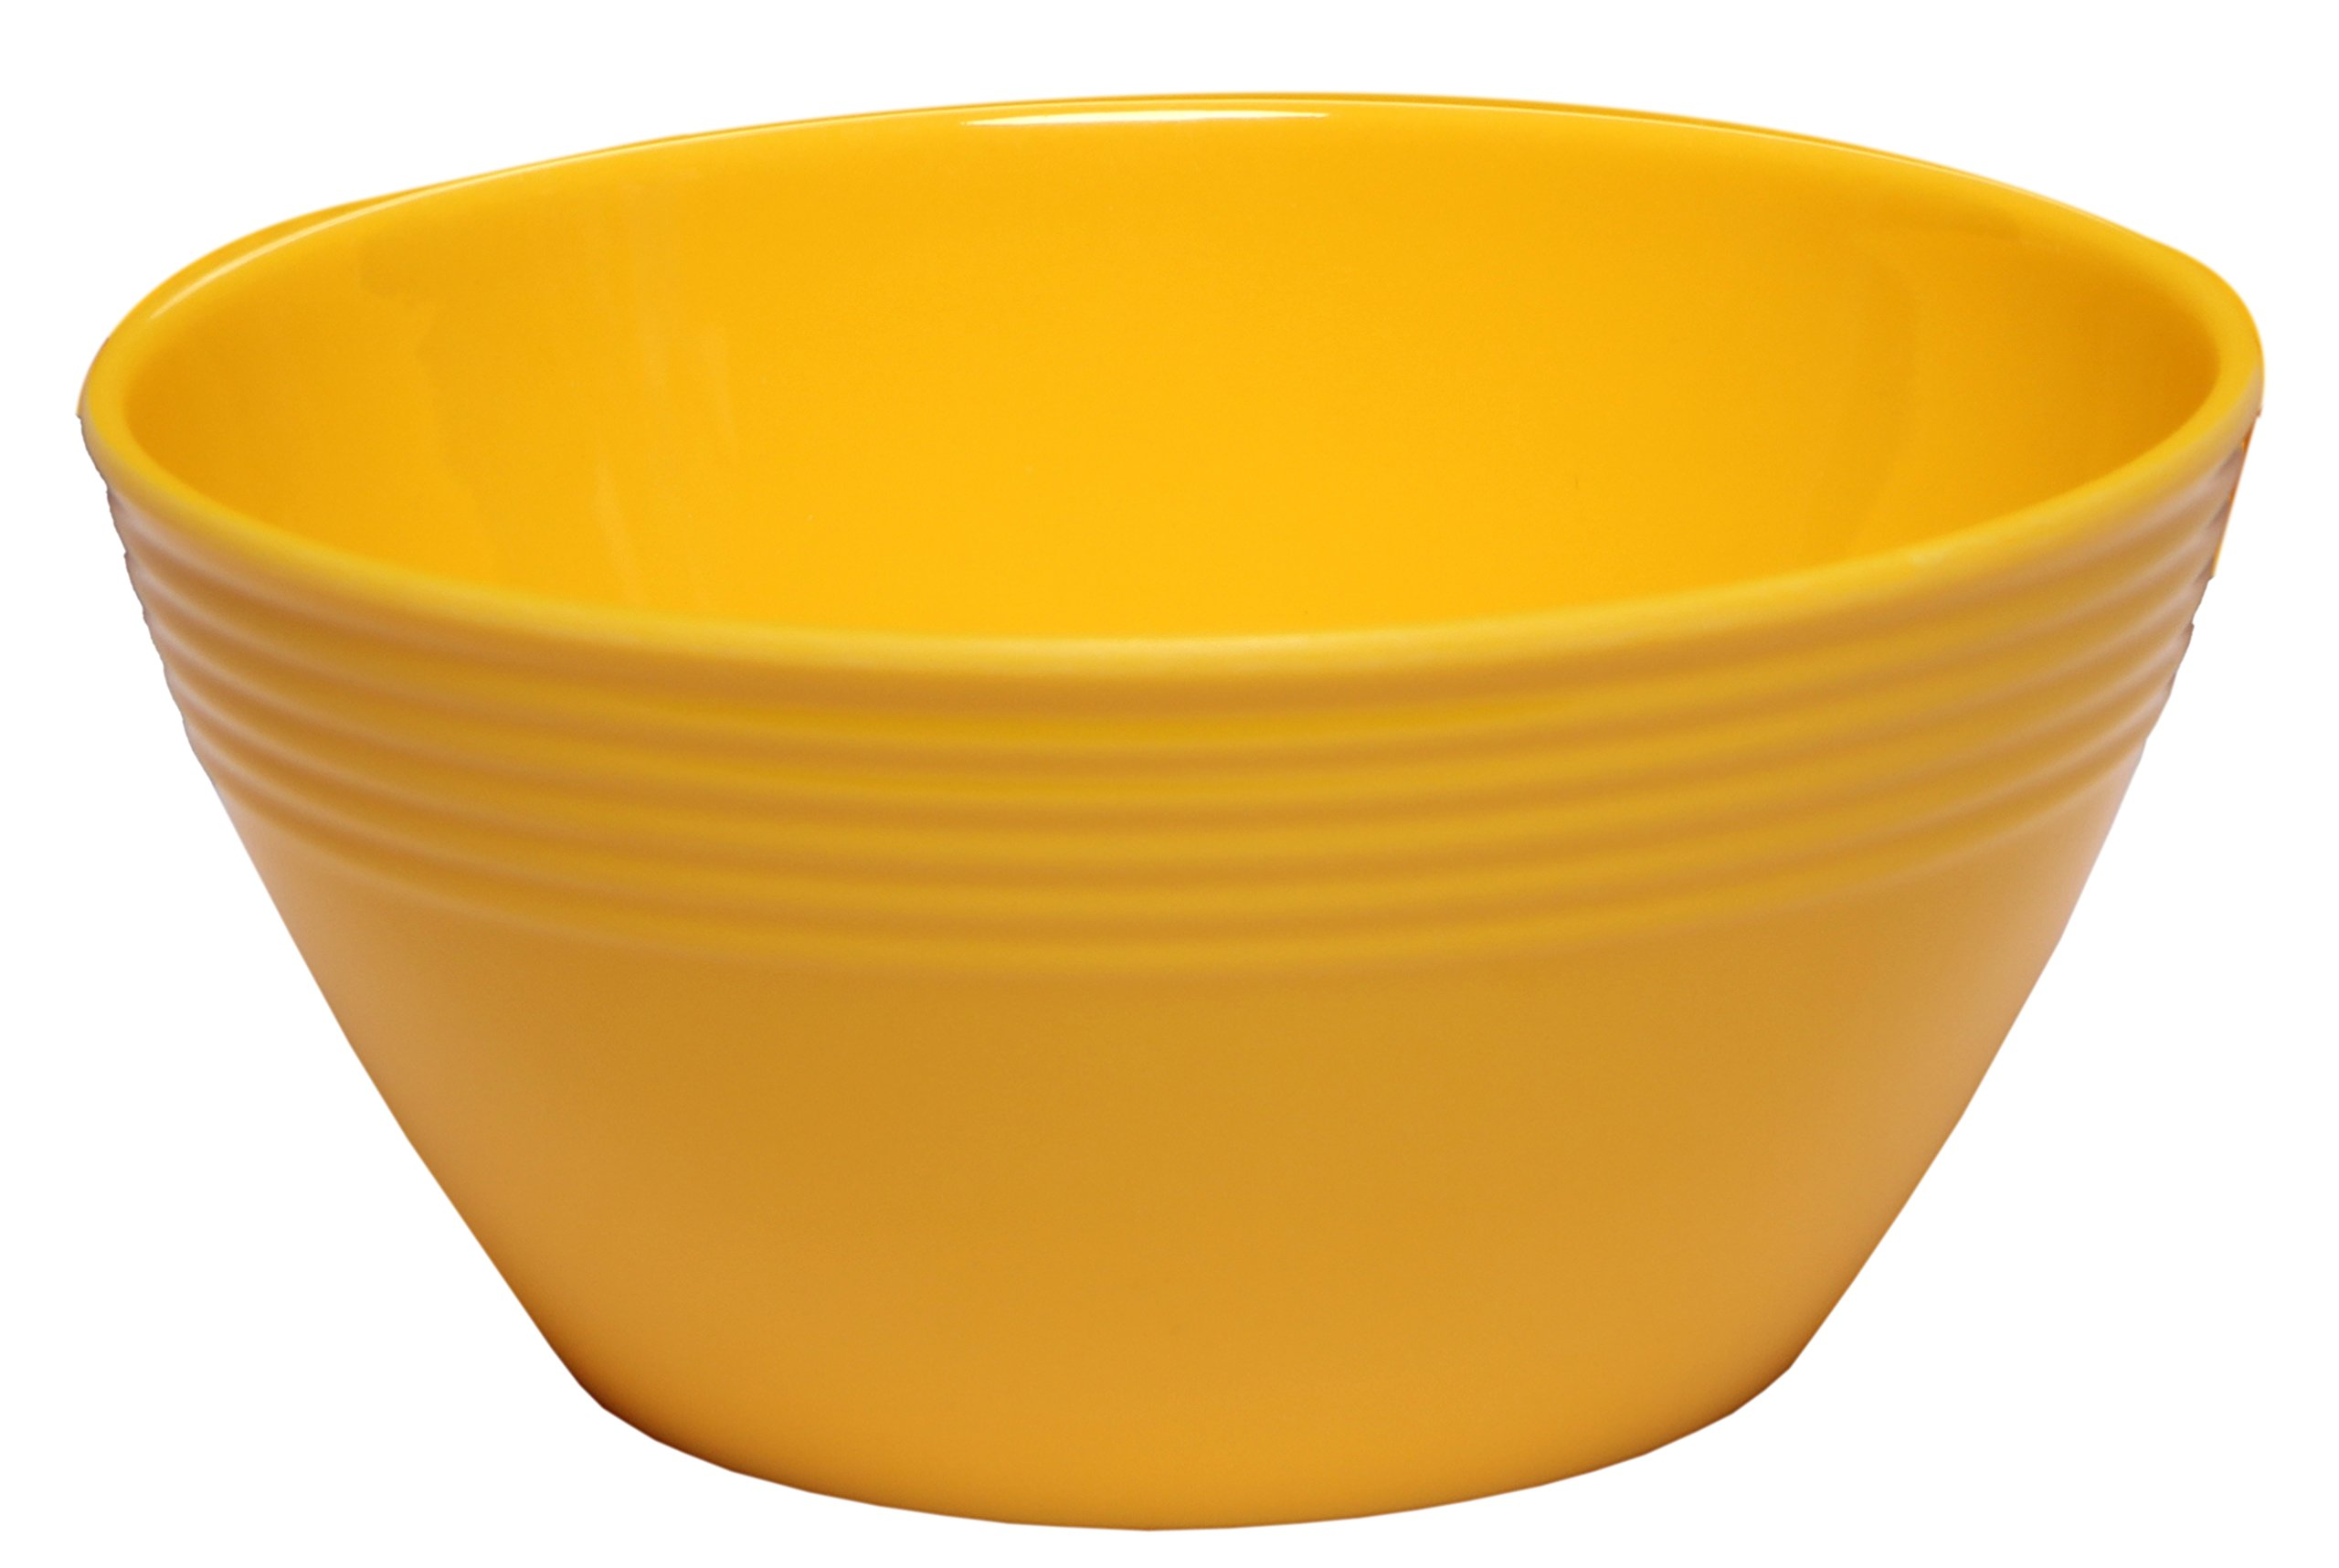 Melange 6-Piece  Melamine Bowl Set (Solids Collection ) | Shatter-Proof and Chip-Resistant Melamine Bowls | Color: Yellow